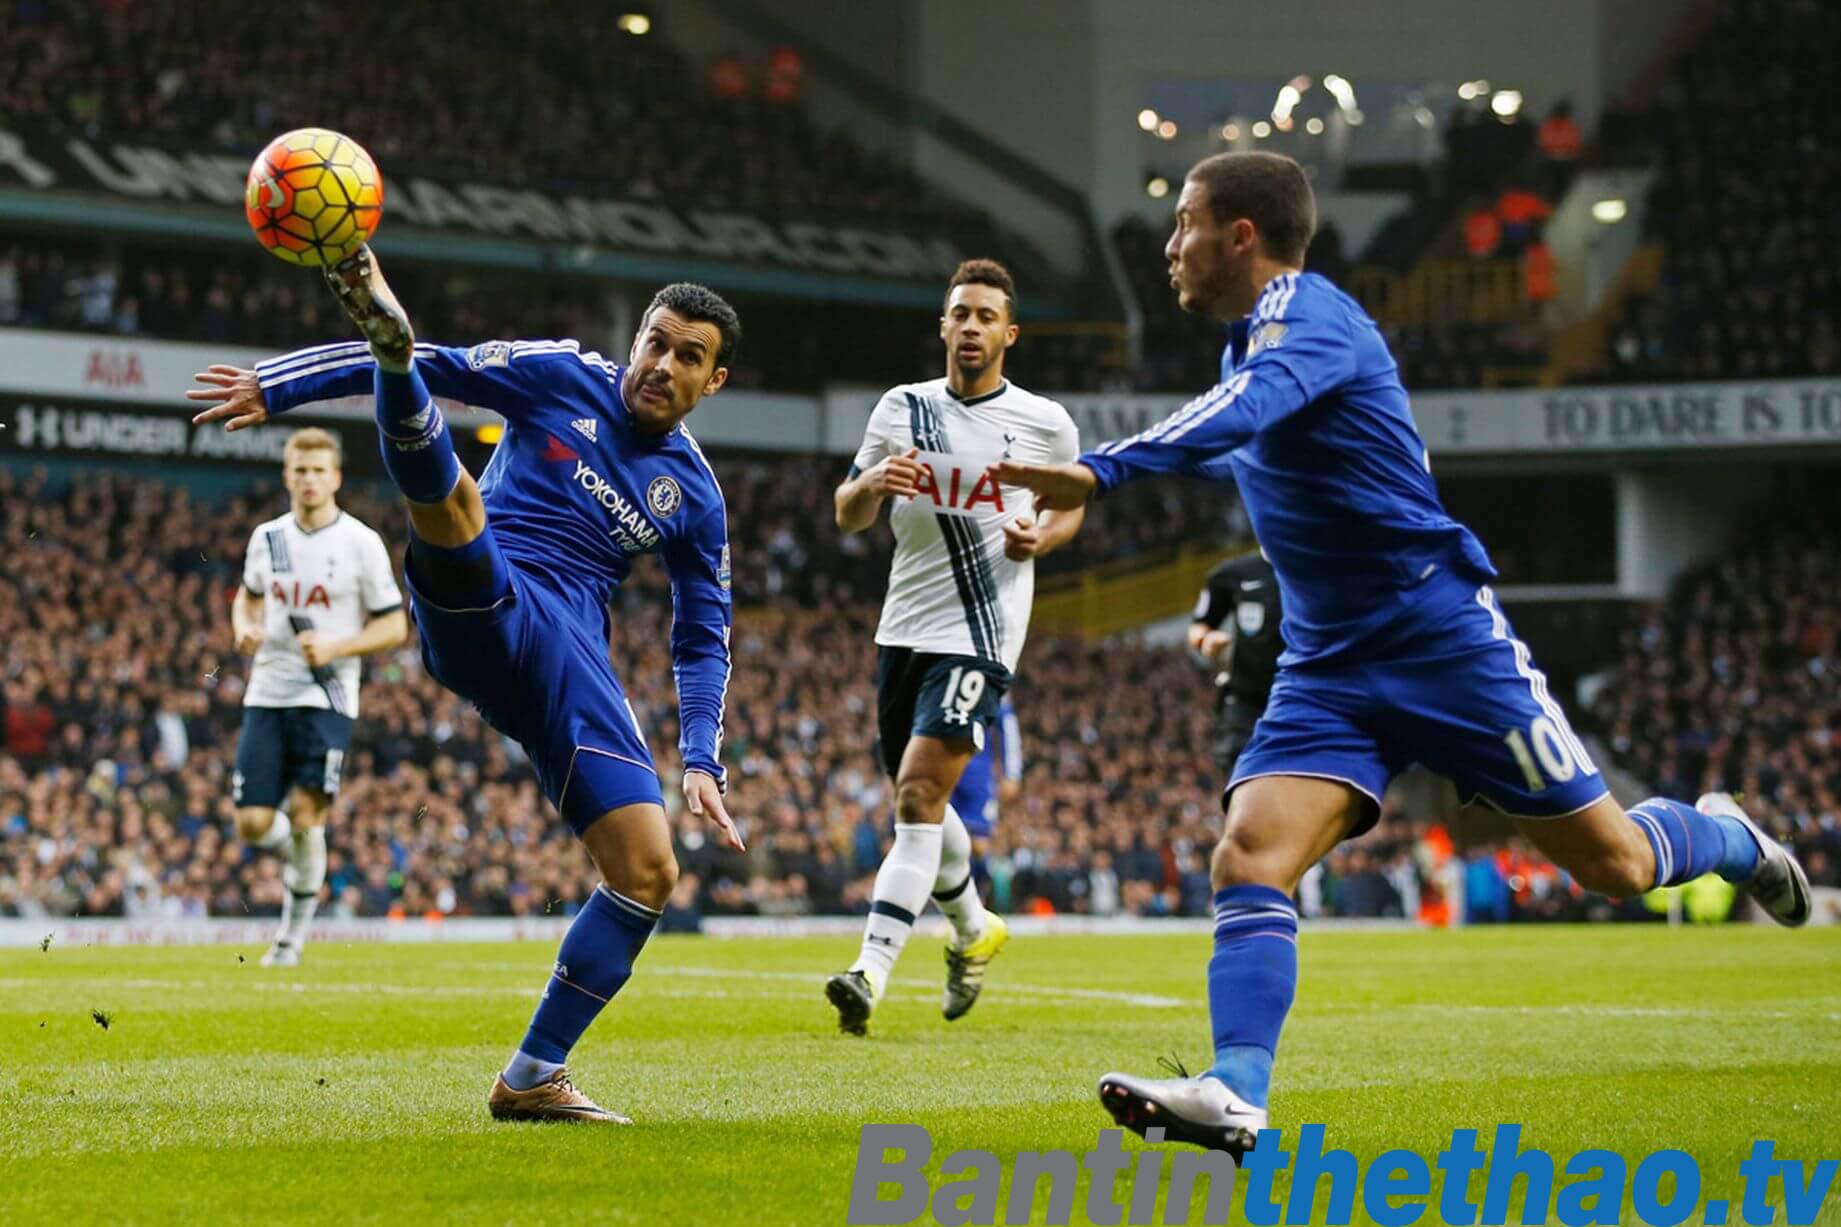 Chelsea vs Tottenham tối nay 01/04/2018 Ngoại Hạng Anh